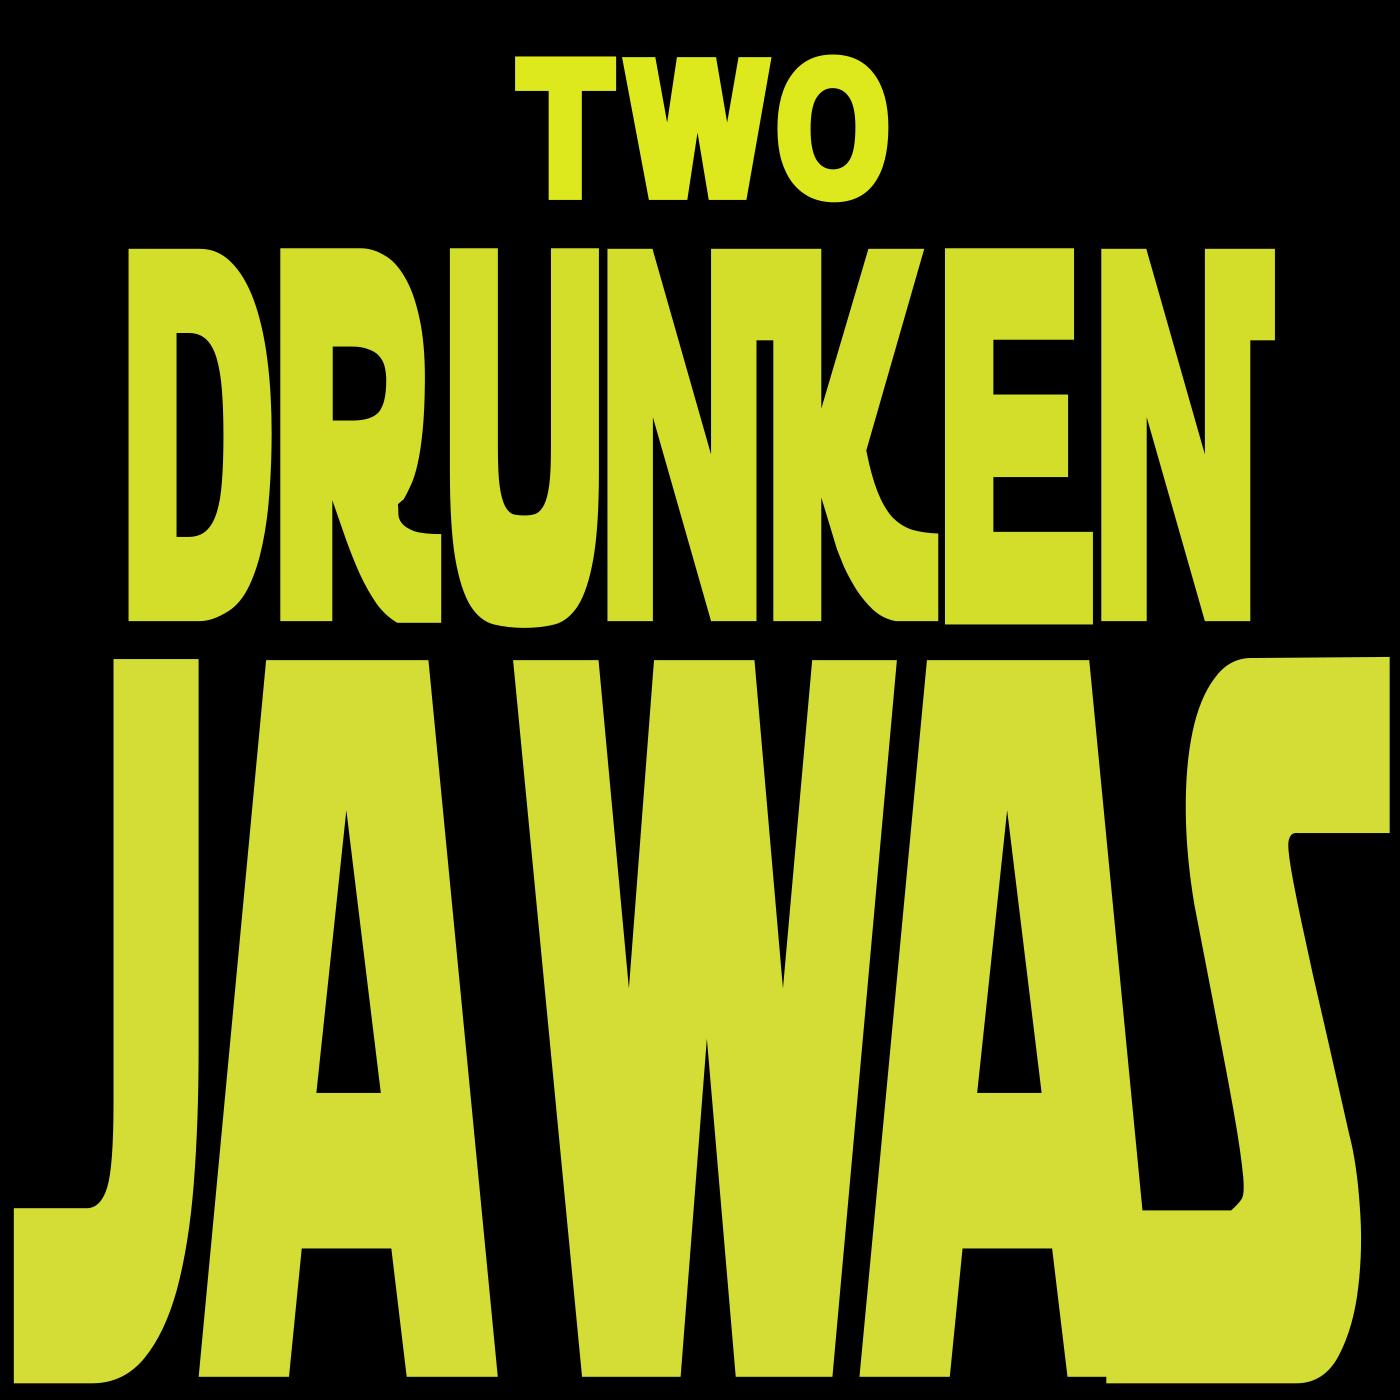 Two Drunken Jawas